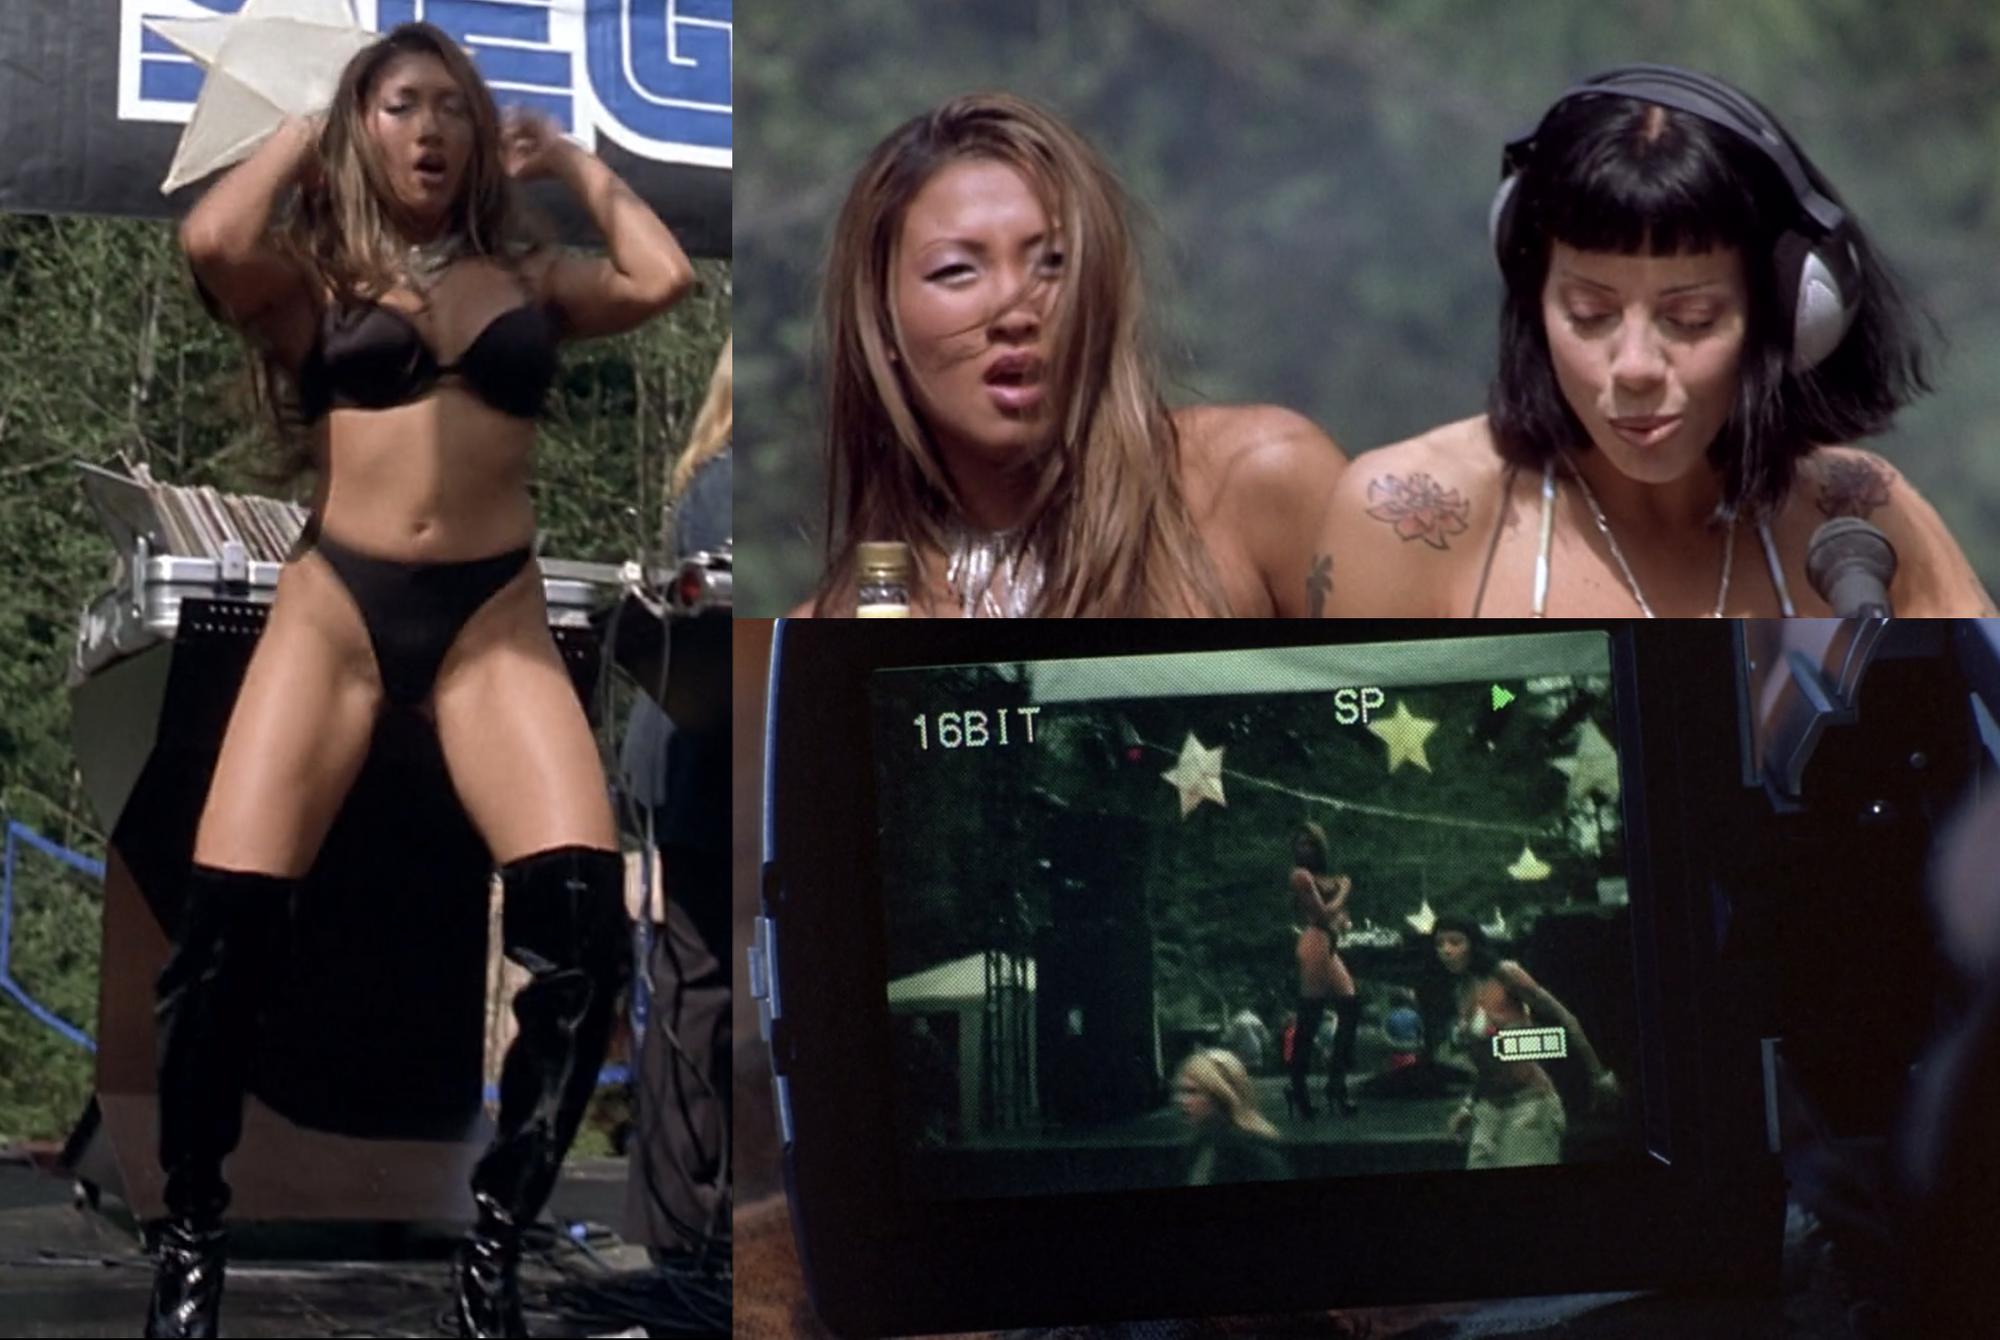 Fiona Vroom Naked penny phang | cinemorgue wiki | fandom poweredwikia